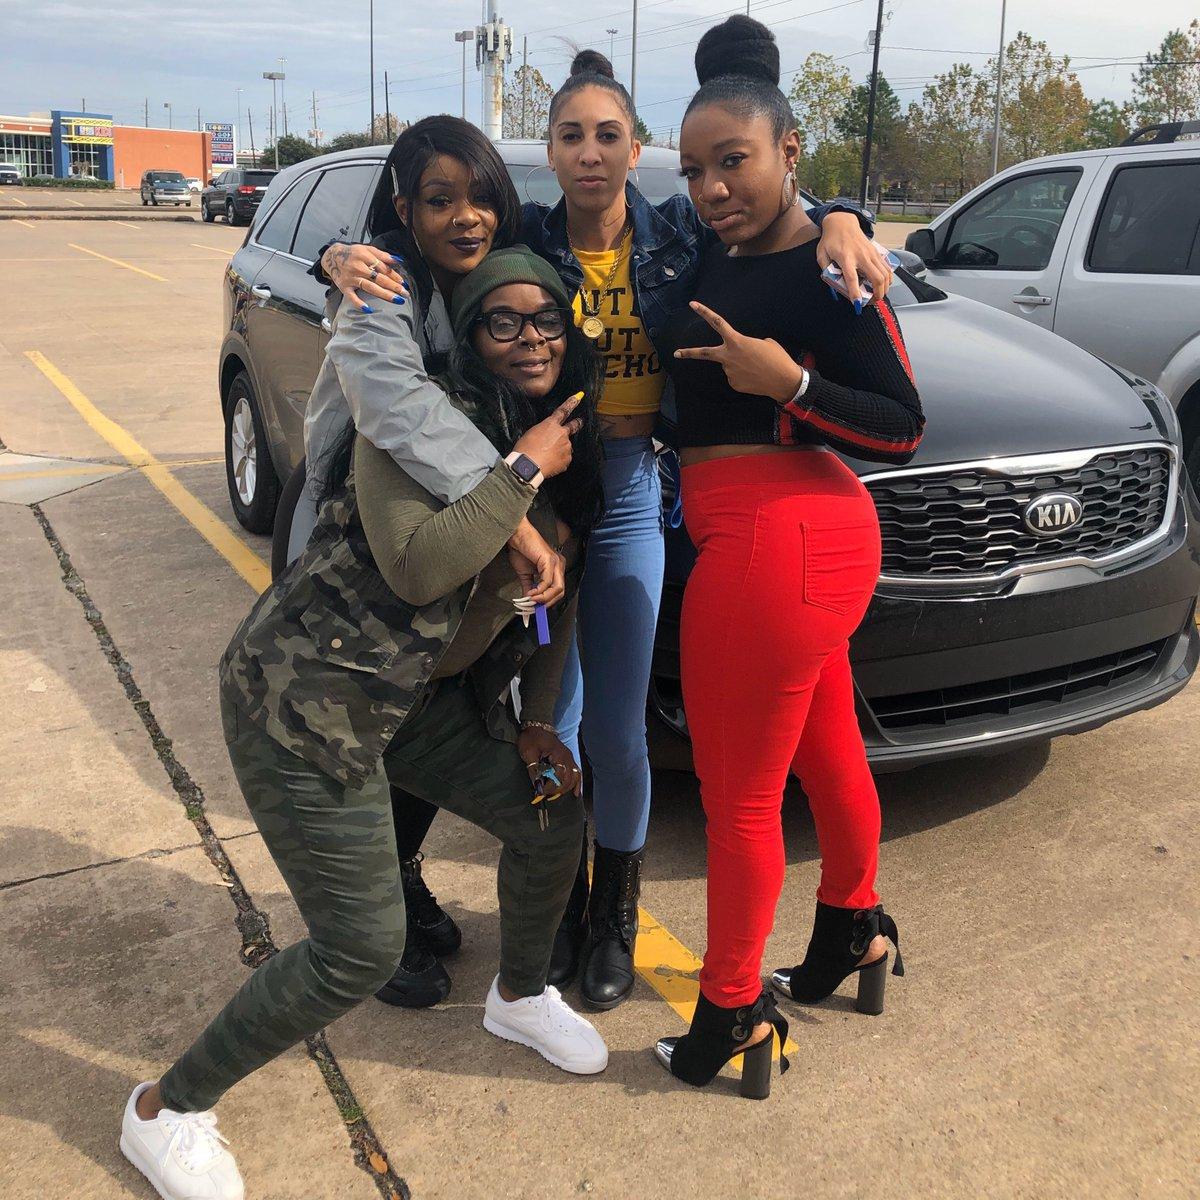 On set filming Episode 5 of @wewantalldasmoke_webseries wit my girls @tahonniebabi @desier_24_red @sabrinathemodel  #LetsGetIt  . . . #bollywoodactresses #actressesandmodels #htownwomenrock #webseries #blackwebseries #modelsoninstagram #womensupportingwomen #entertainmentpic.twitter.com/s0nUbIfXeZ